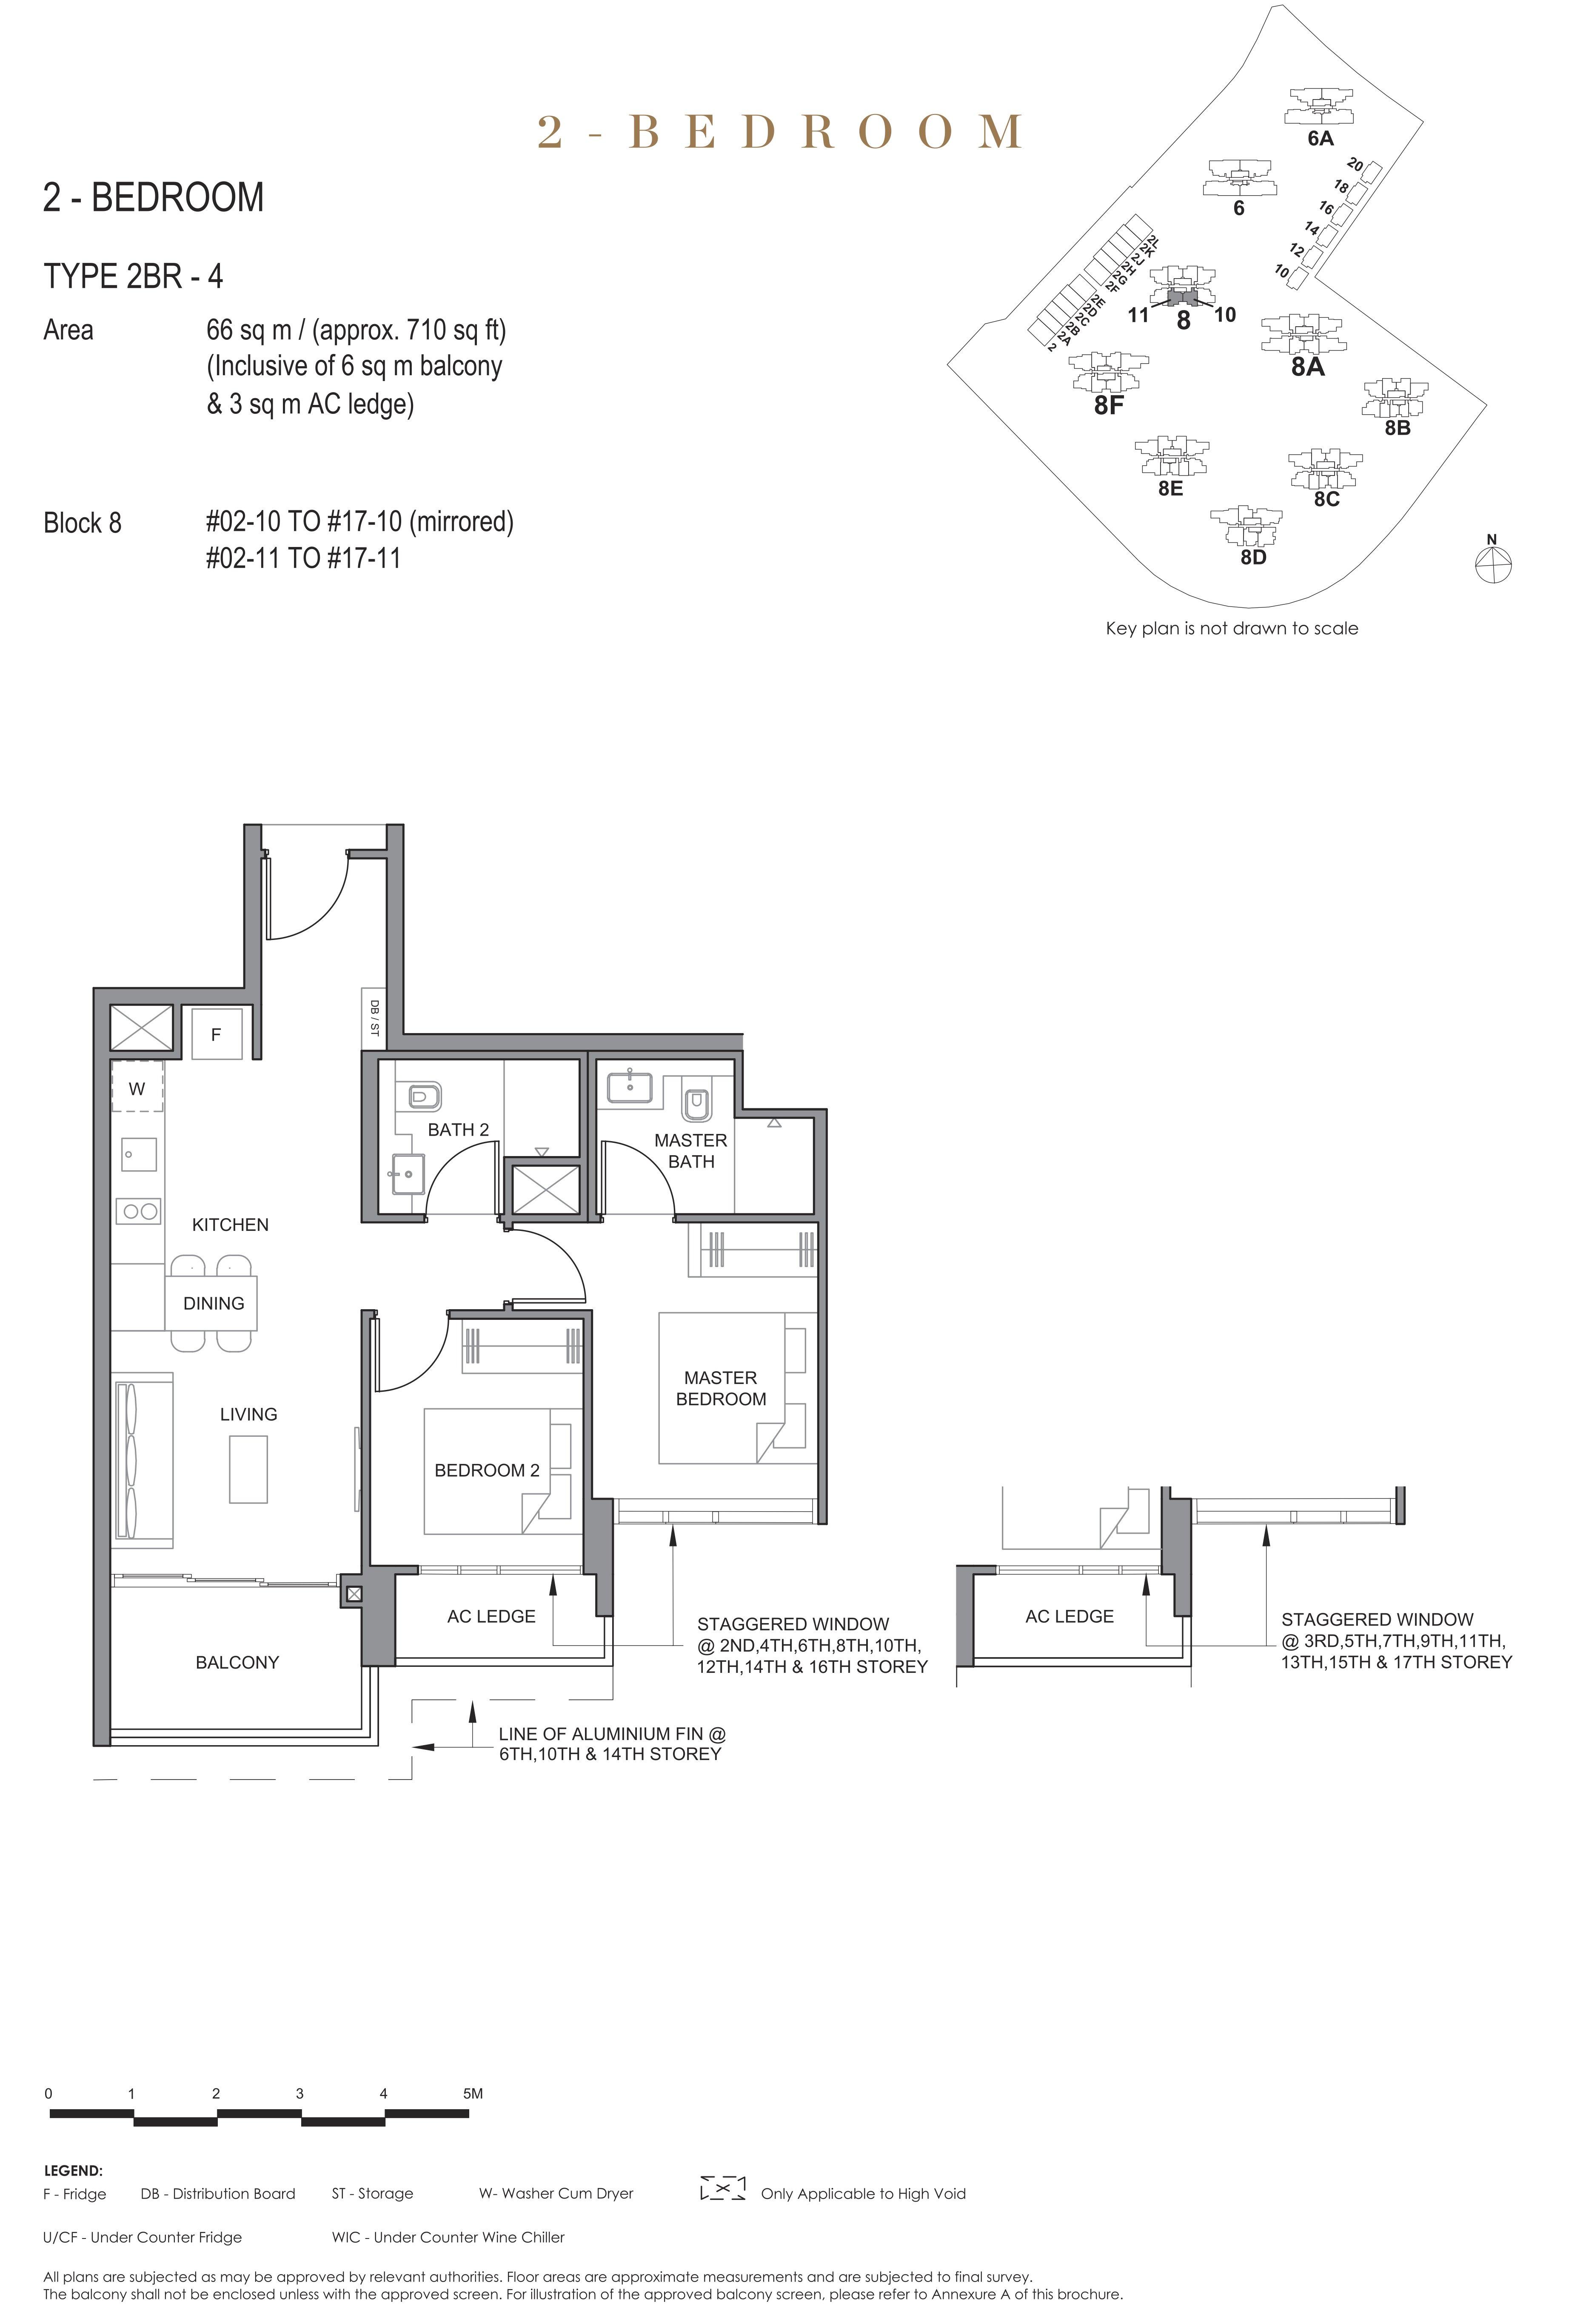 Parc Clematis 锦泰门第 elegance 2 bedroom 2卧房 2BR-4